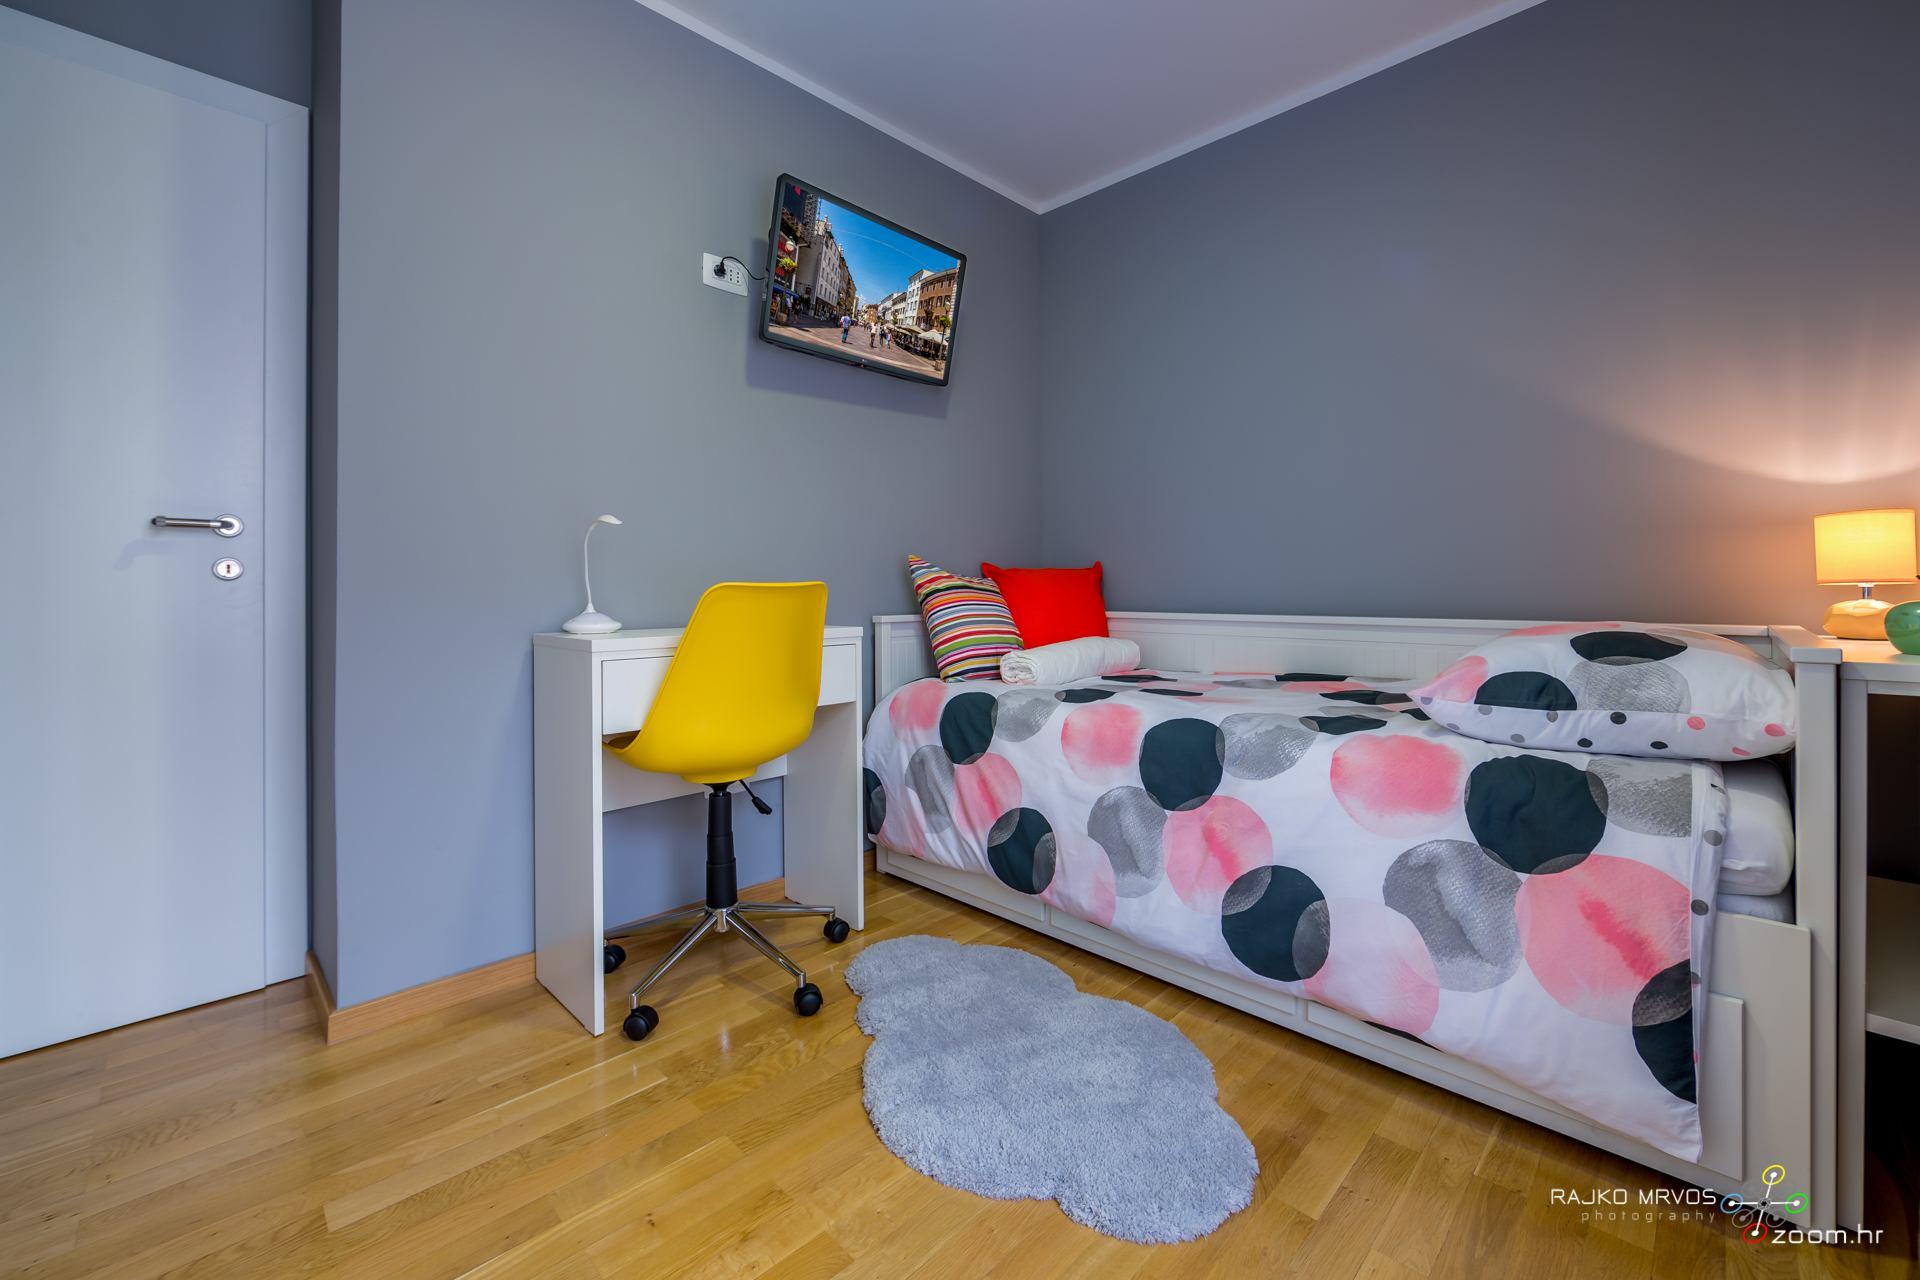 profesionalno-fotografiranje-interijera-fotograf-apartmana-apartman-Elena-Rijeka-26